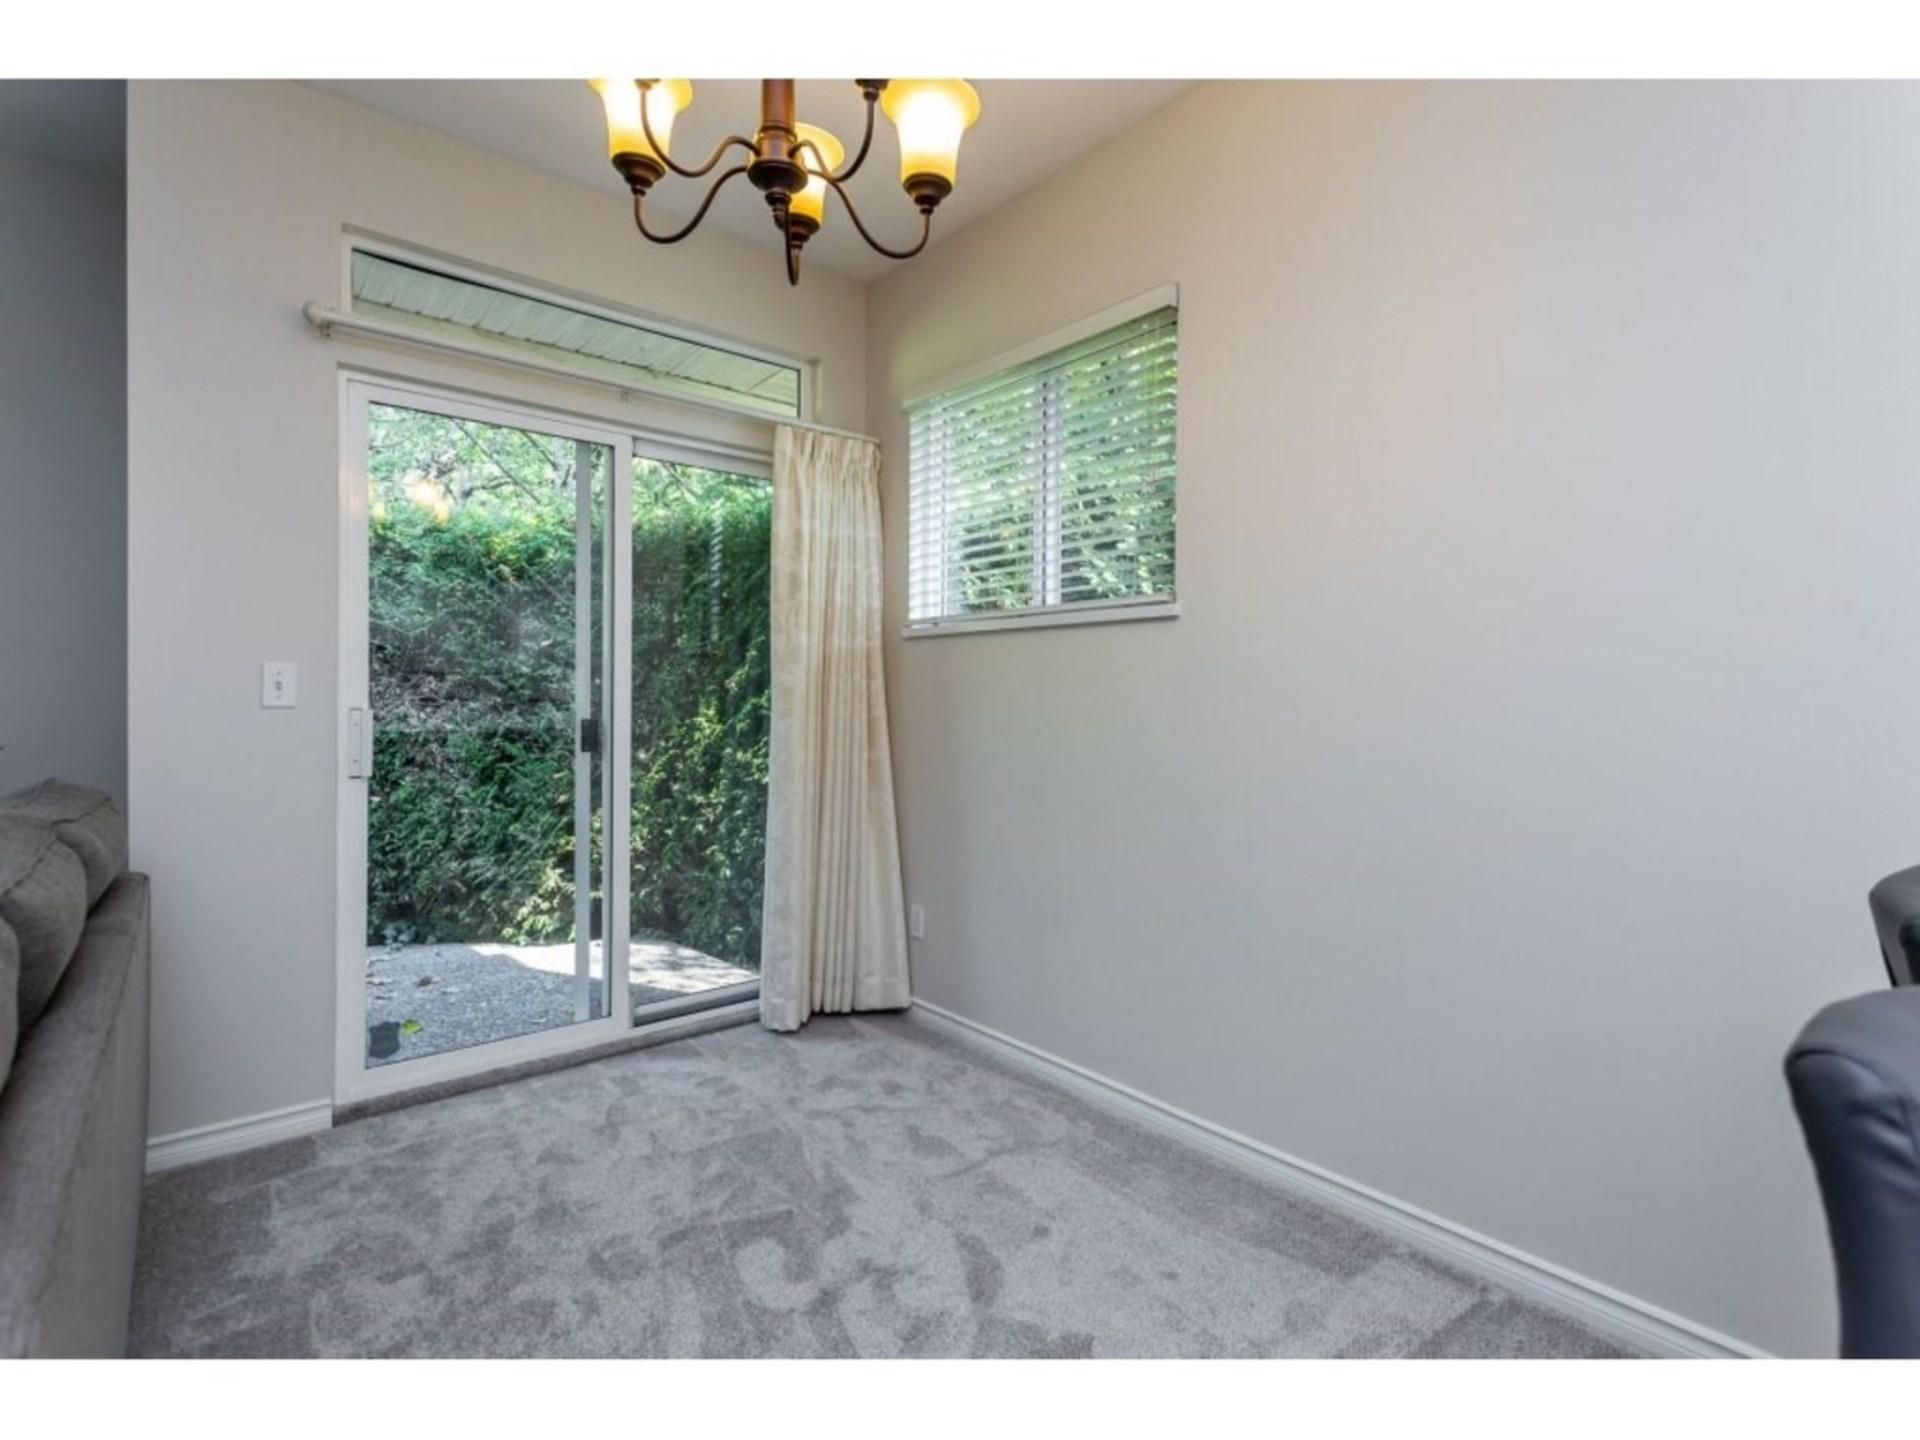 20655-88-avenue-walnut-grove-langley-10 at 330 - 20655 88 Avenue, Walnut Grove, Langley